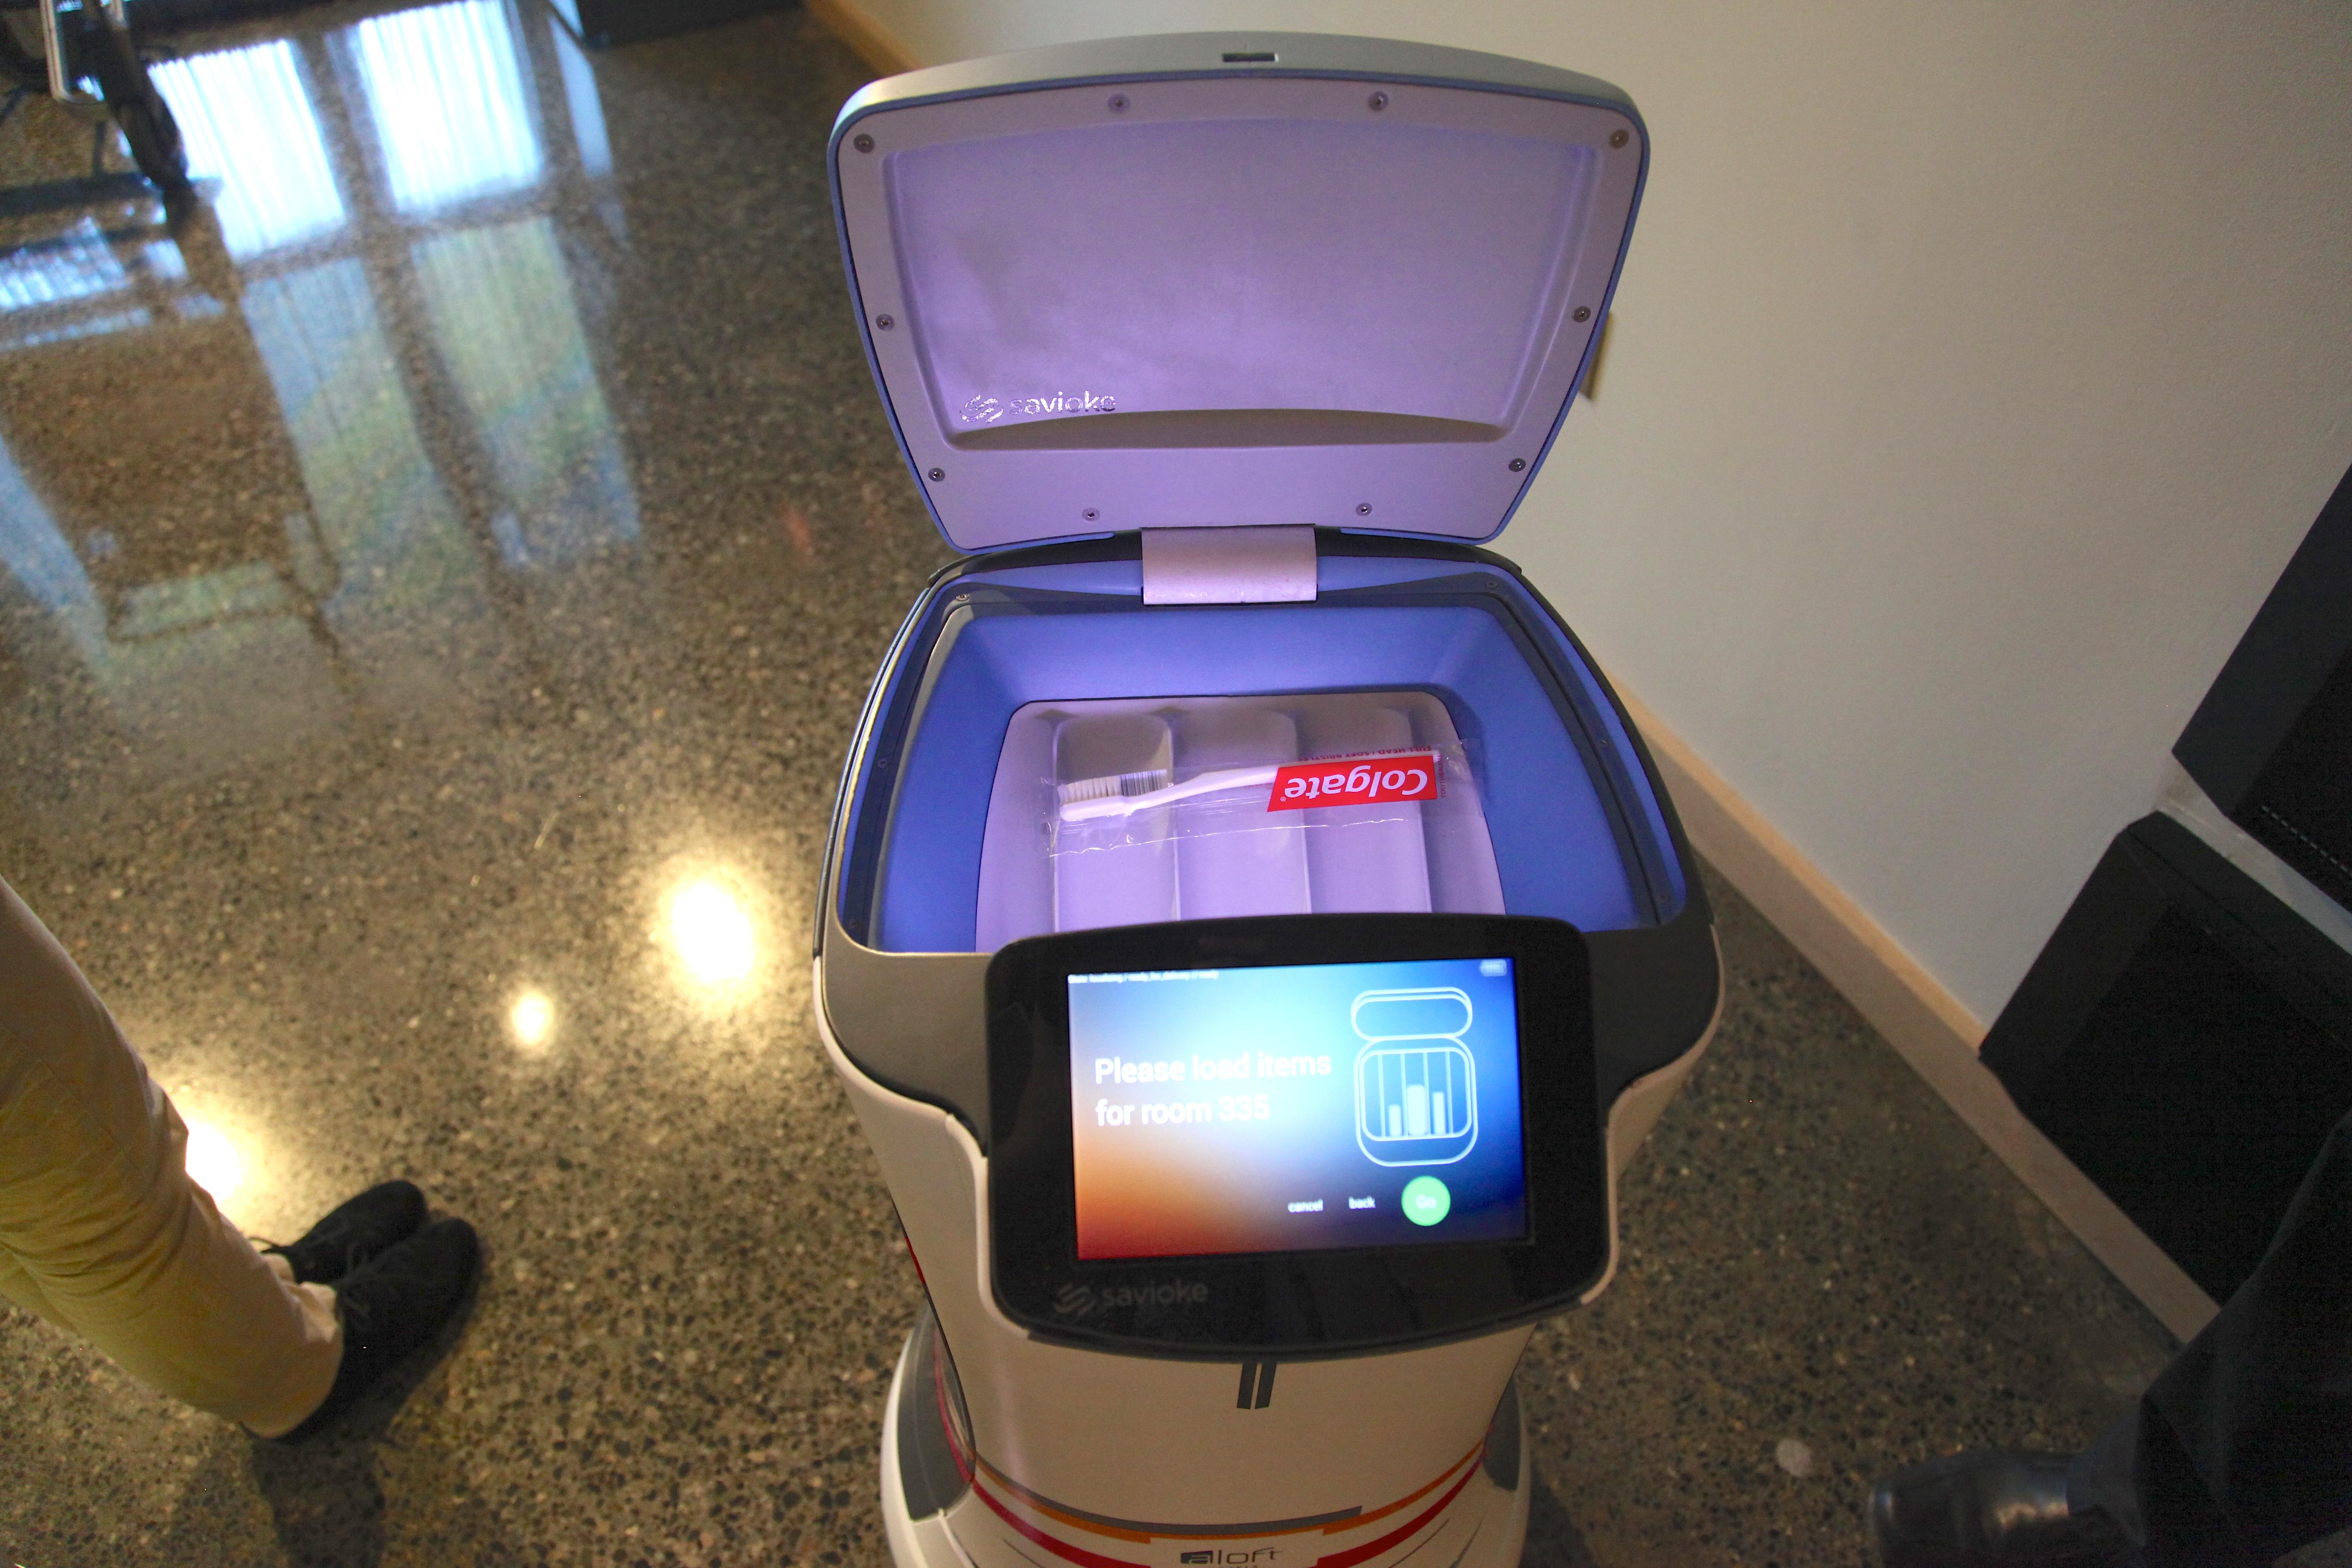 Robot Room Service Elevator